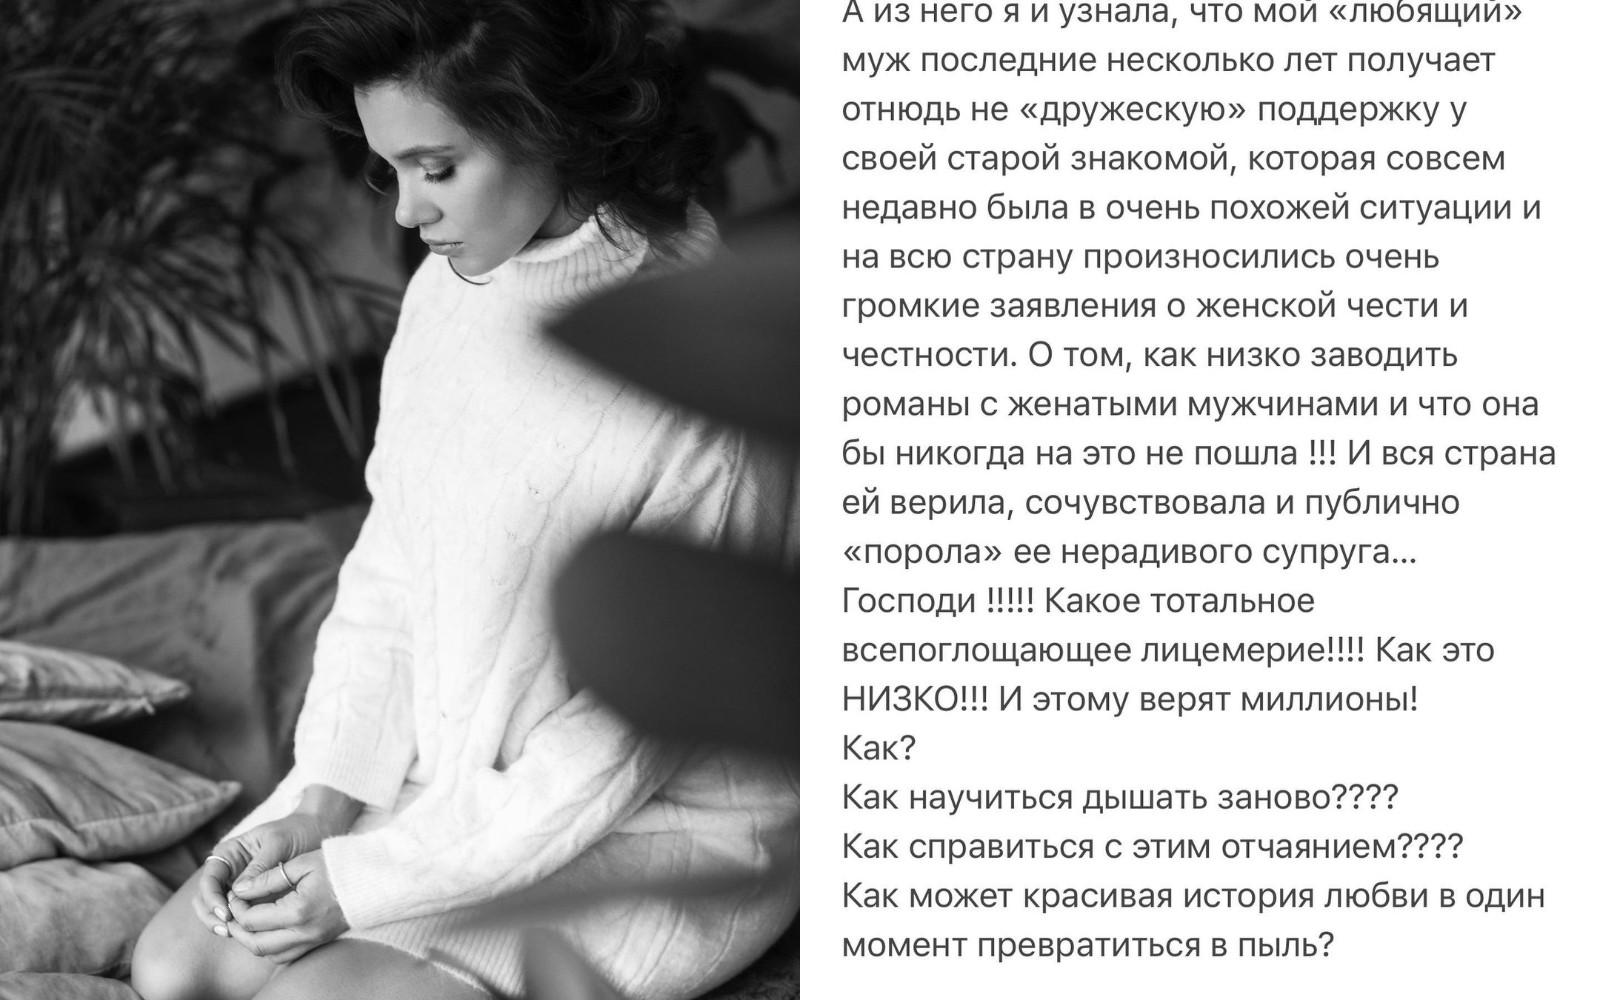 Фото © Instagram / galina_bezruk